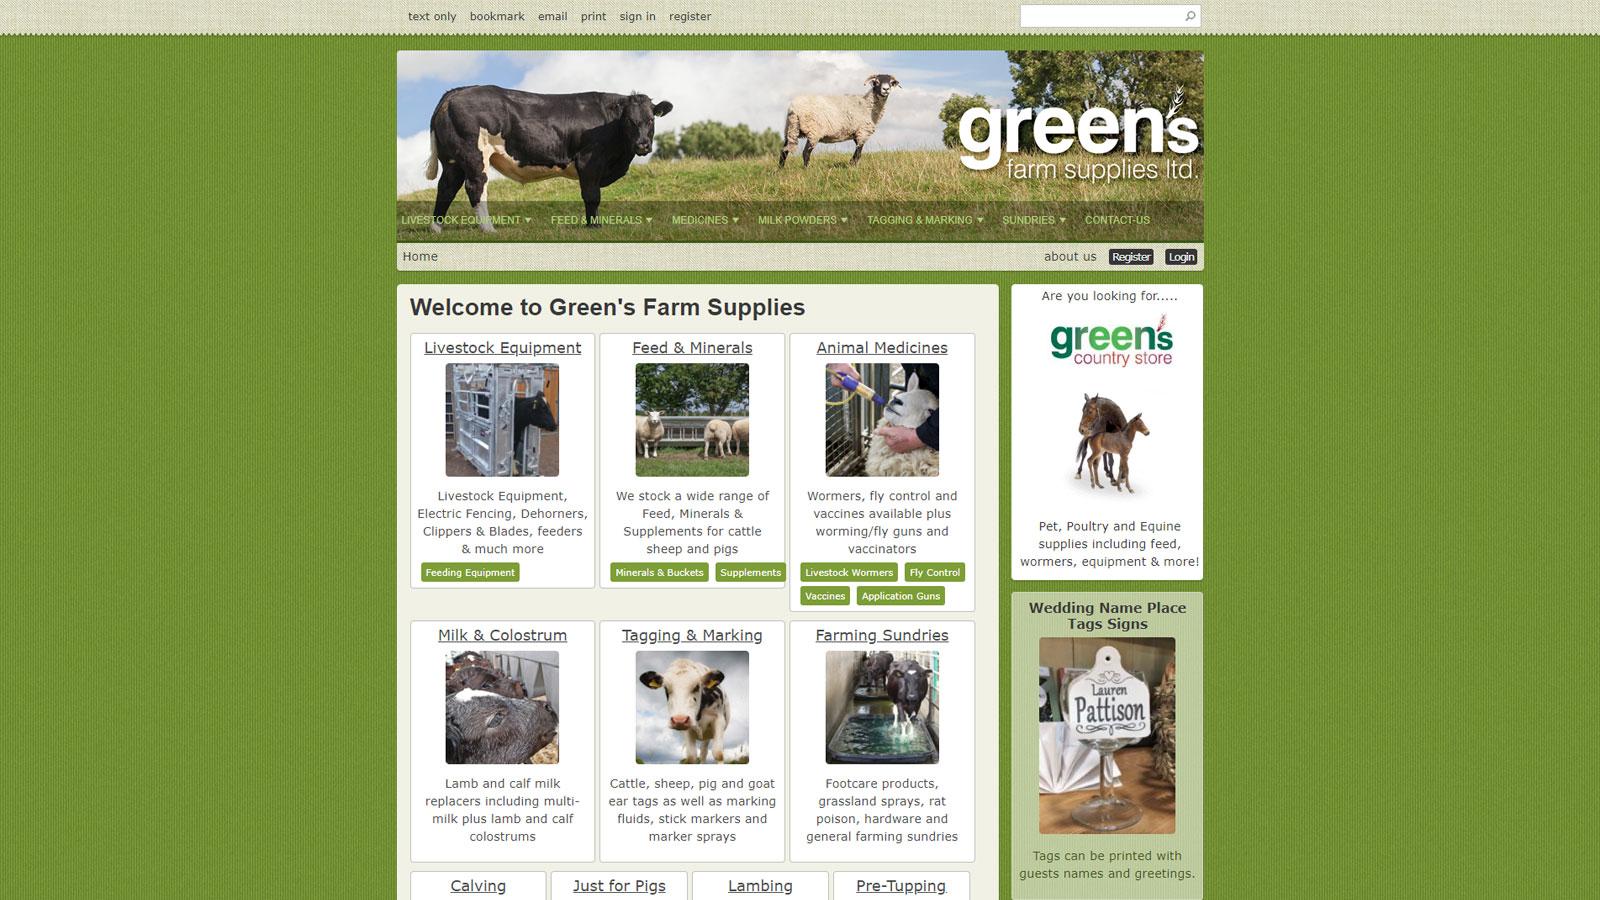 www.greensfarmsupplies.co.uk